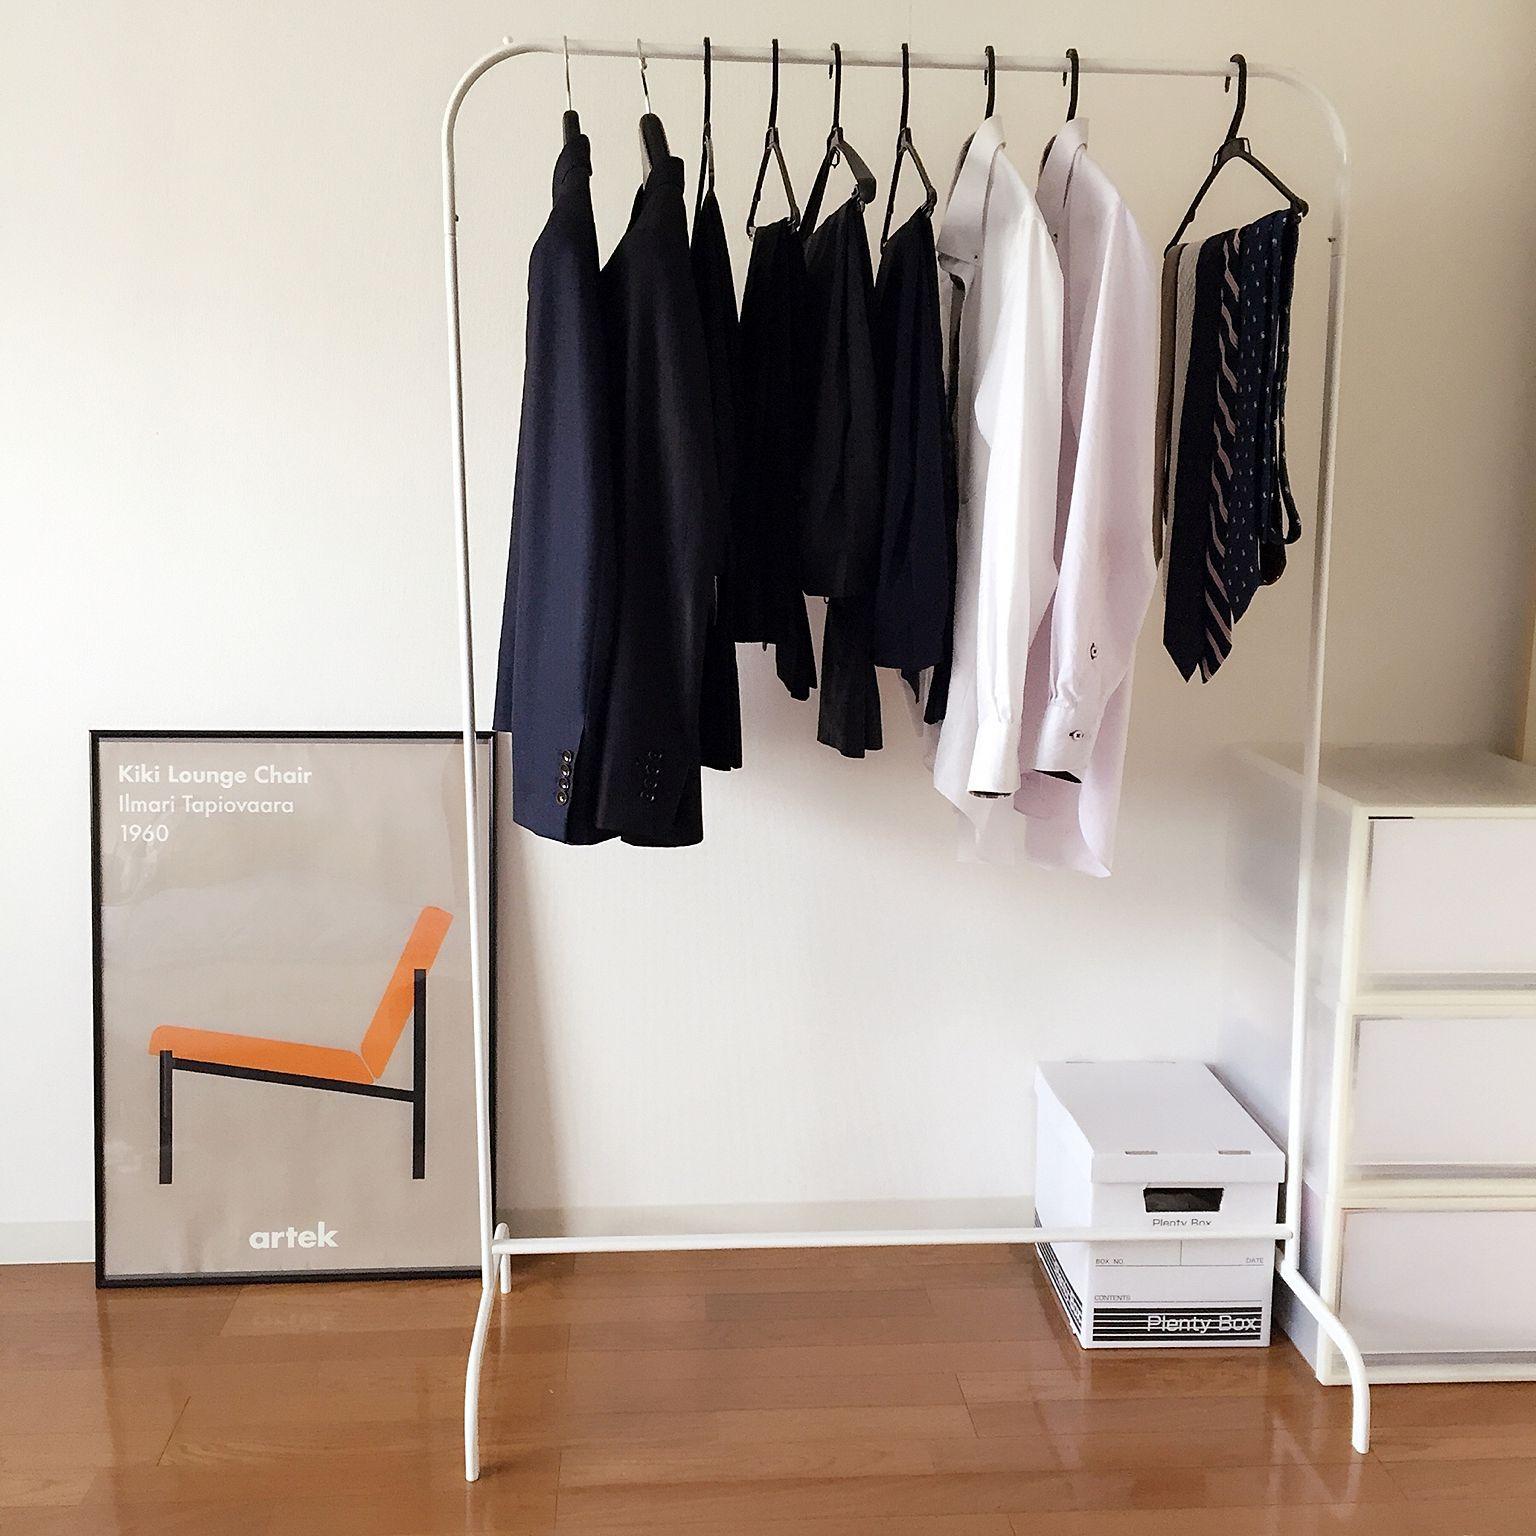 Bedroom/無印良品/ポスター/IKEA/ハンガーラック/収納.